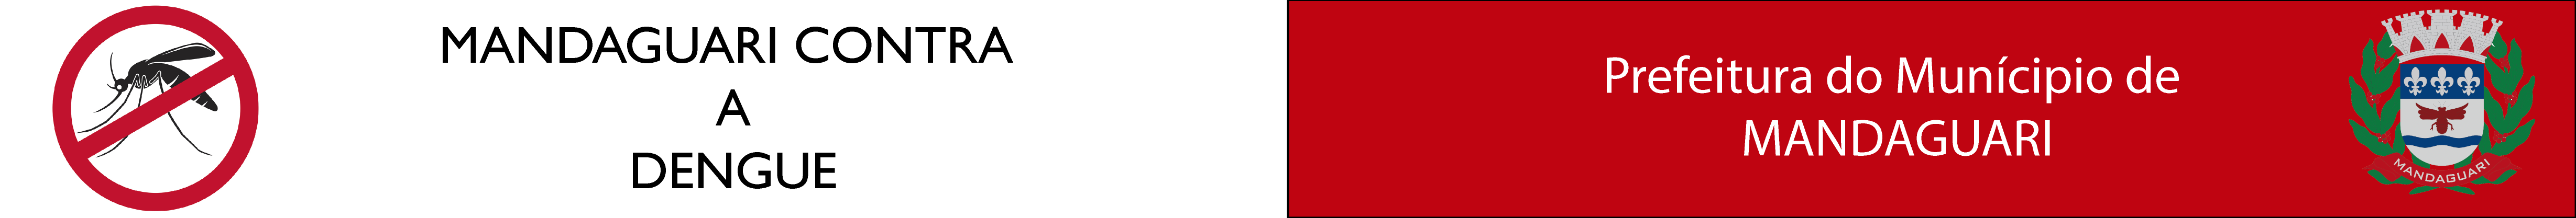 Banner Dengue-01